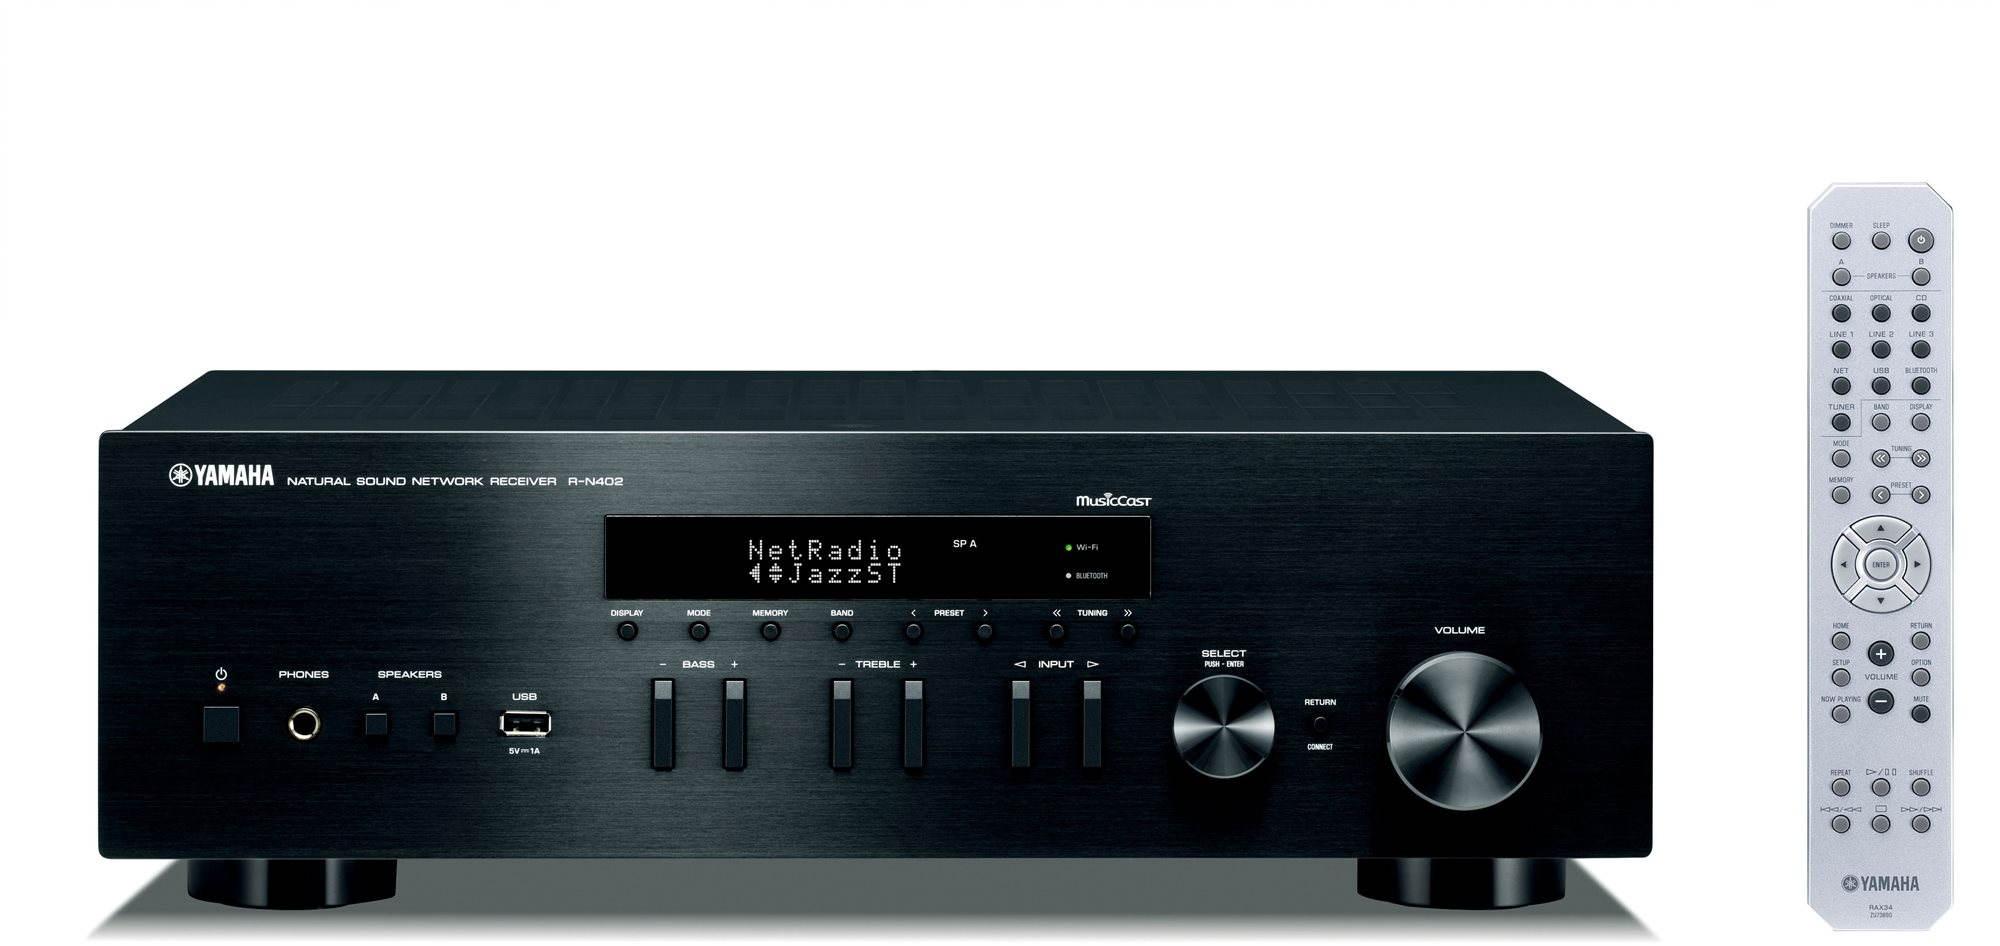 Stereo Receiver YAMAHA R-N402 (D) černý